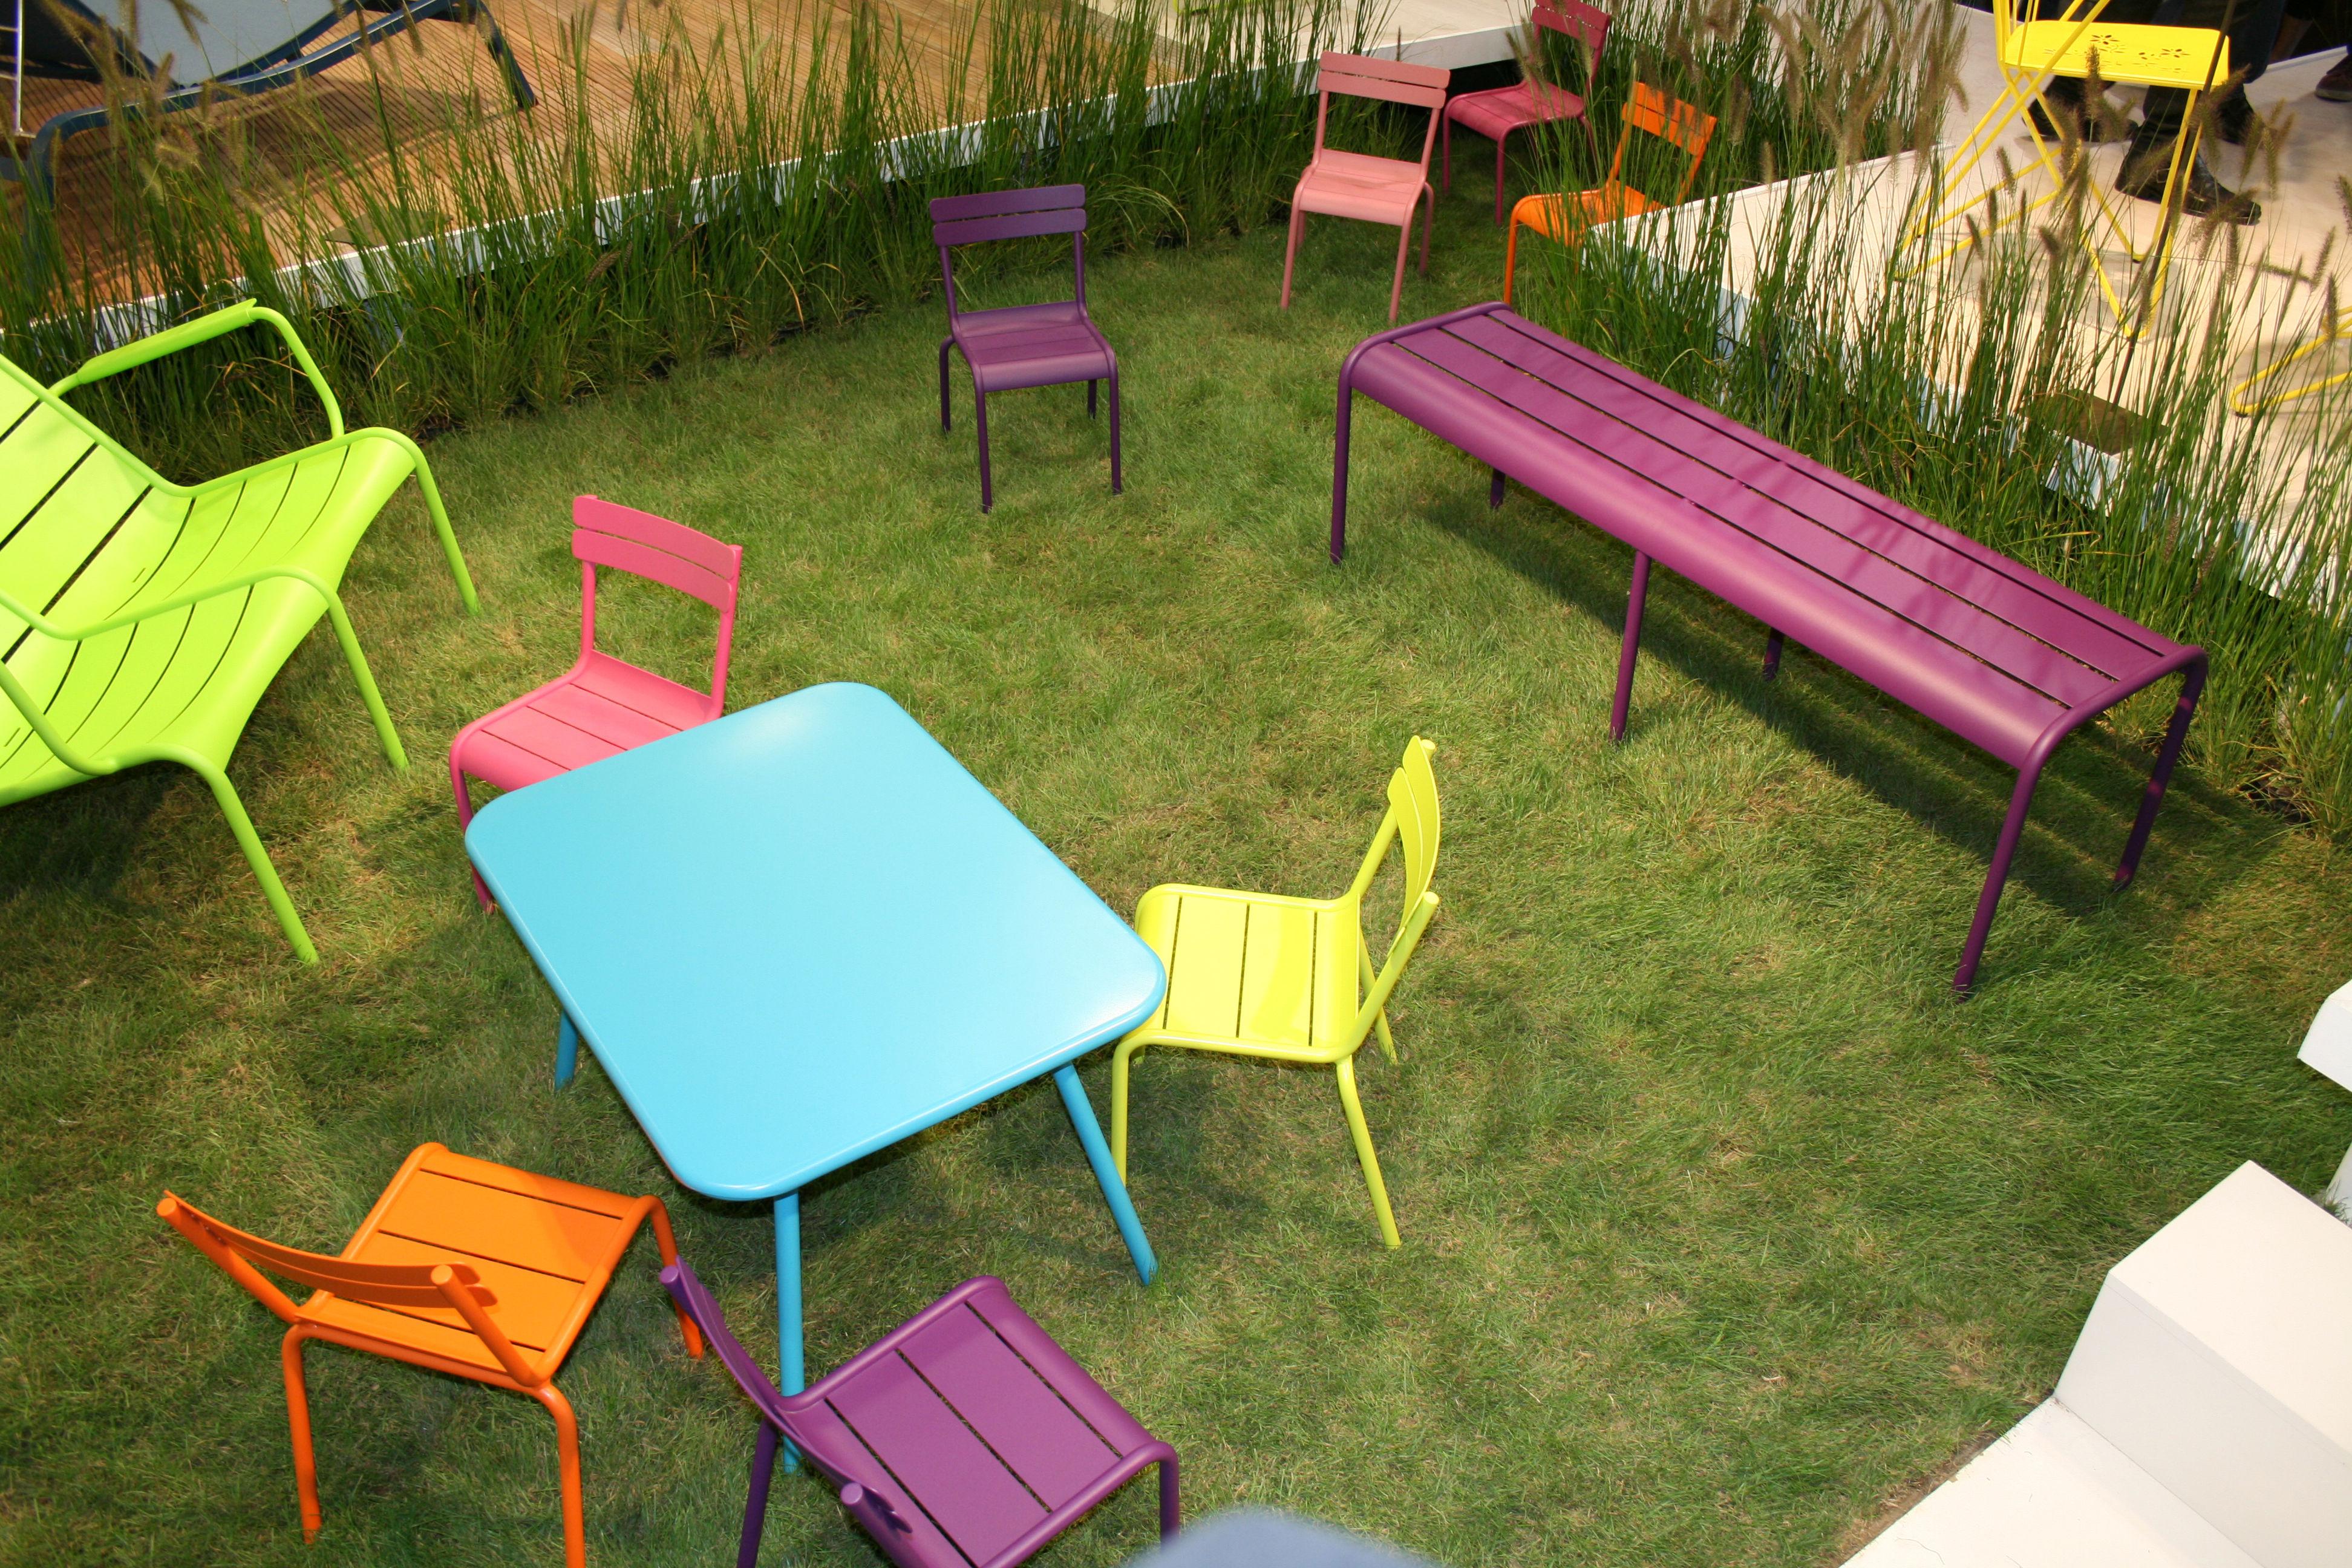 Salon de jardin fermob - Mailleraye.fr jardin